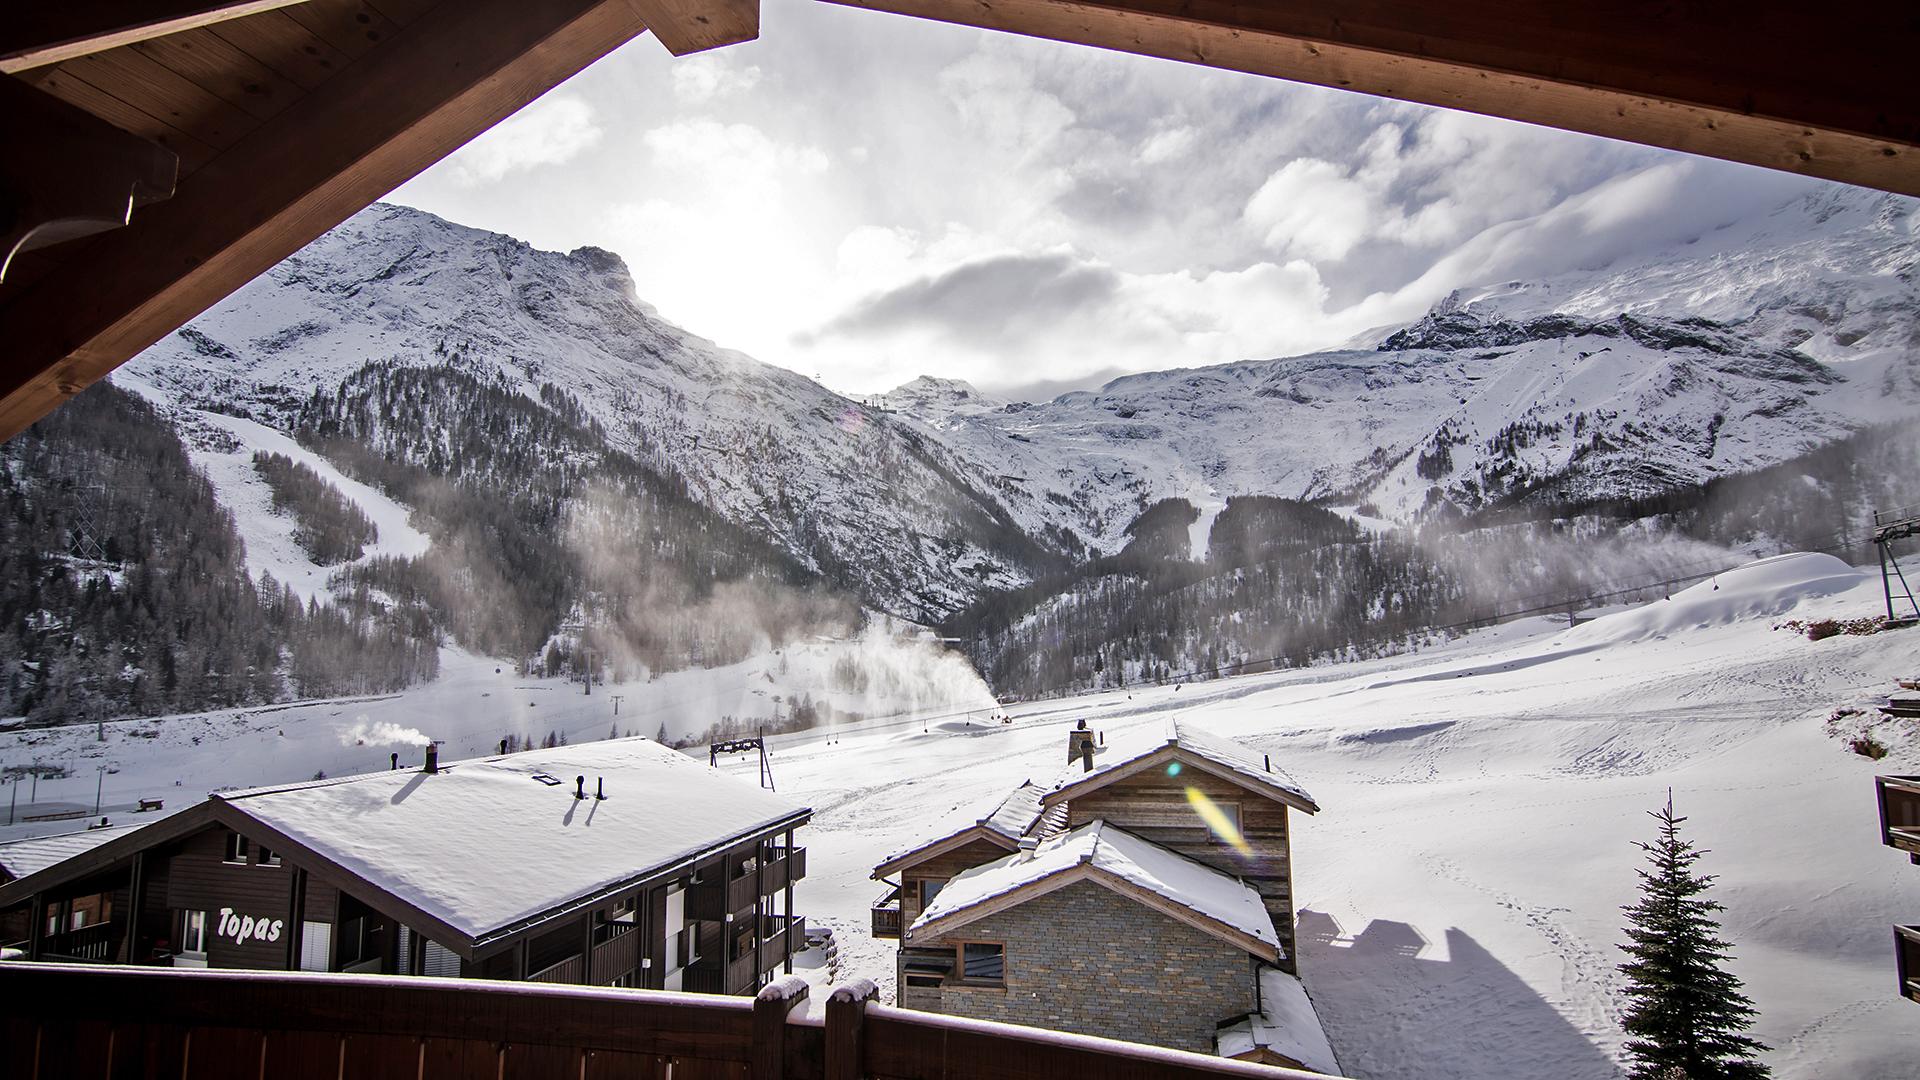 Chalet Aramis 10 Apartments, Switzerland